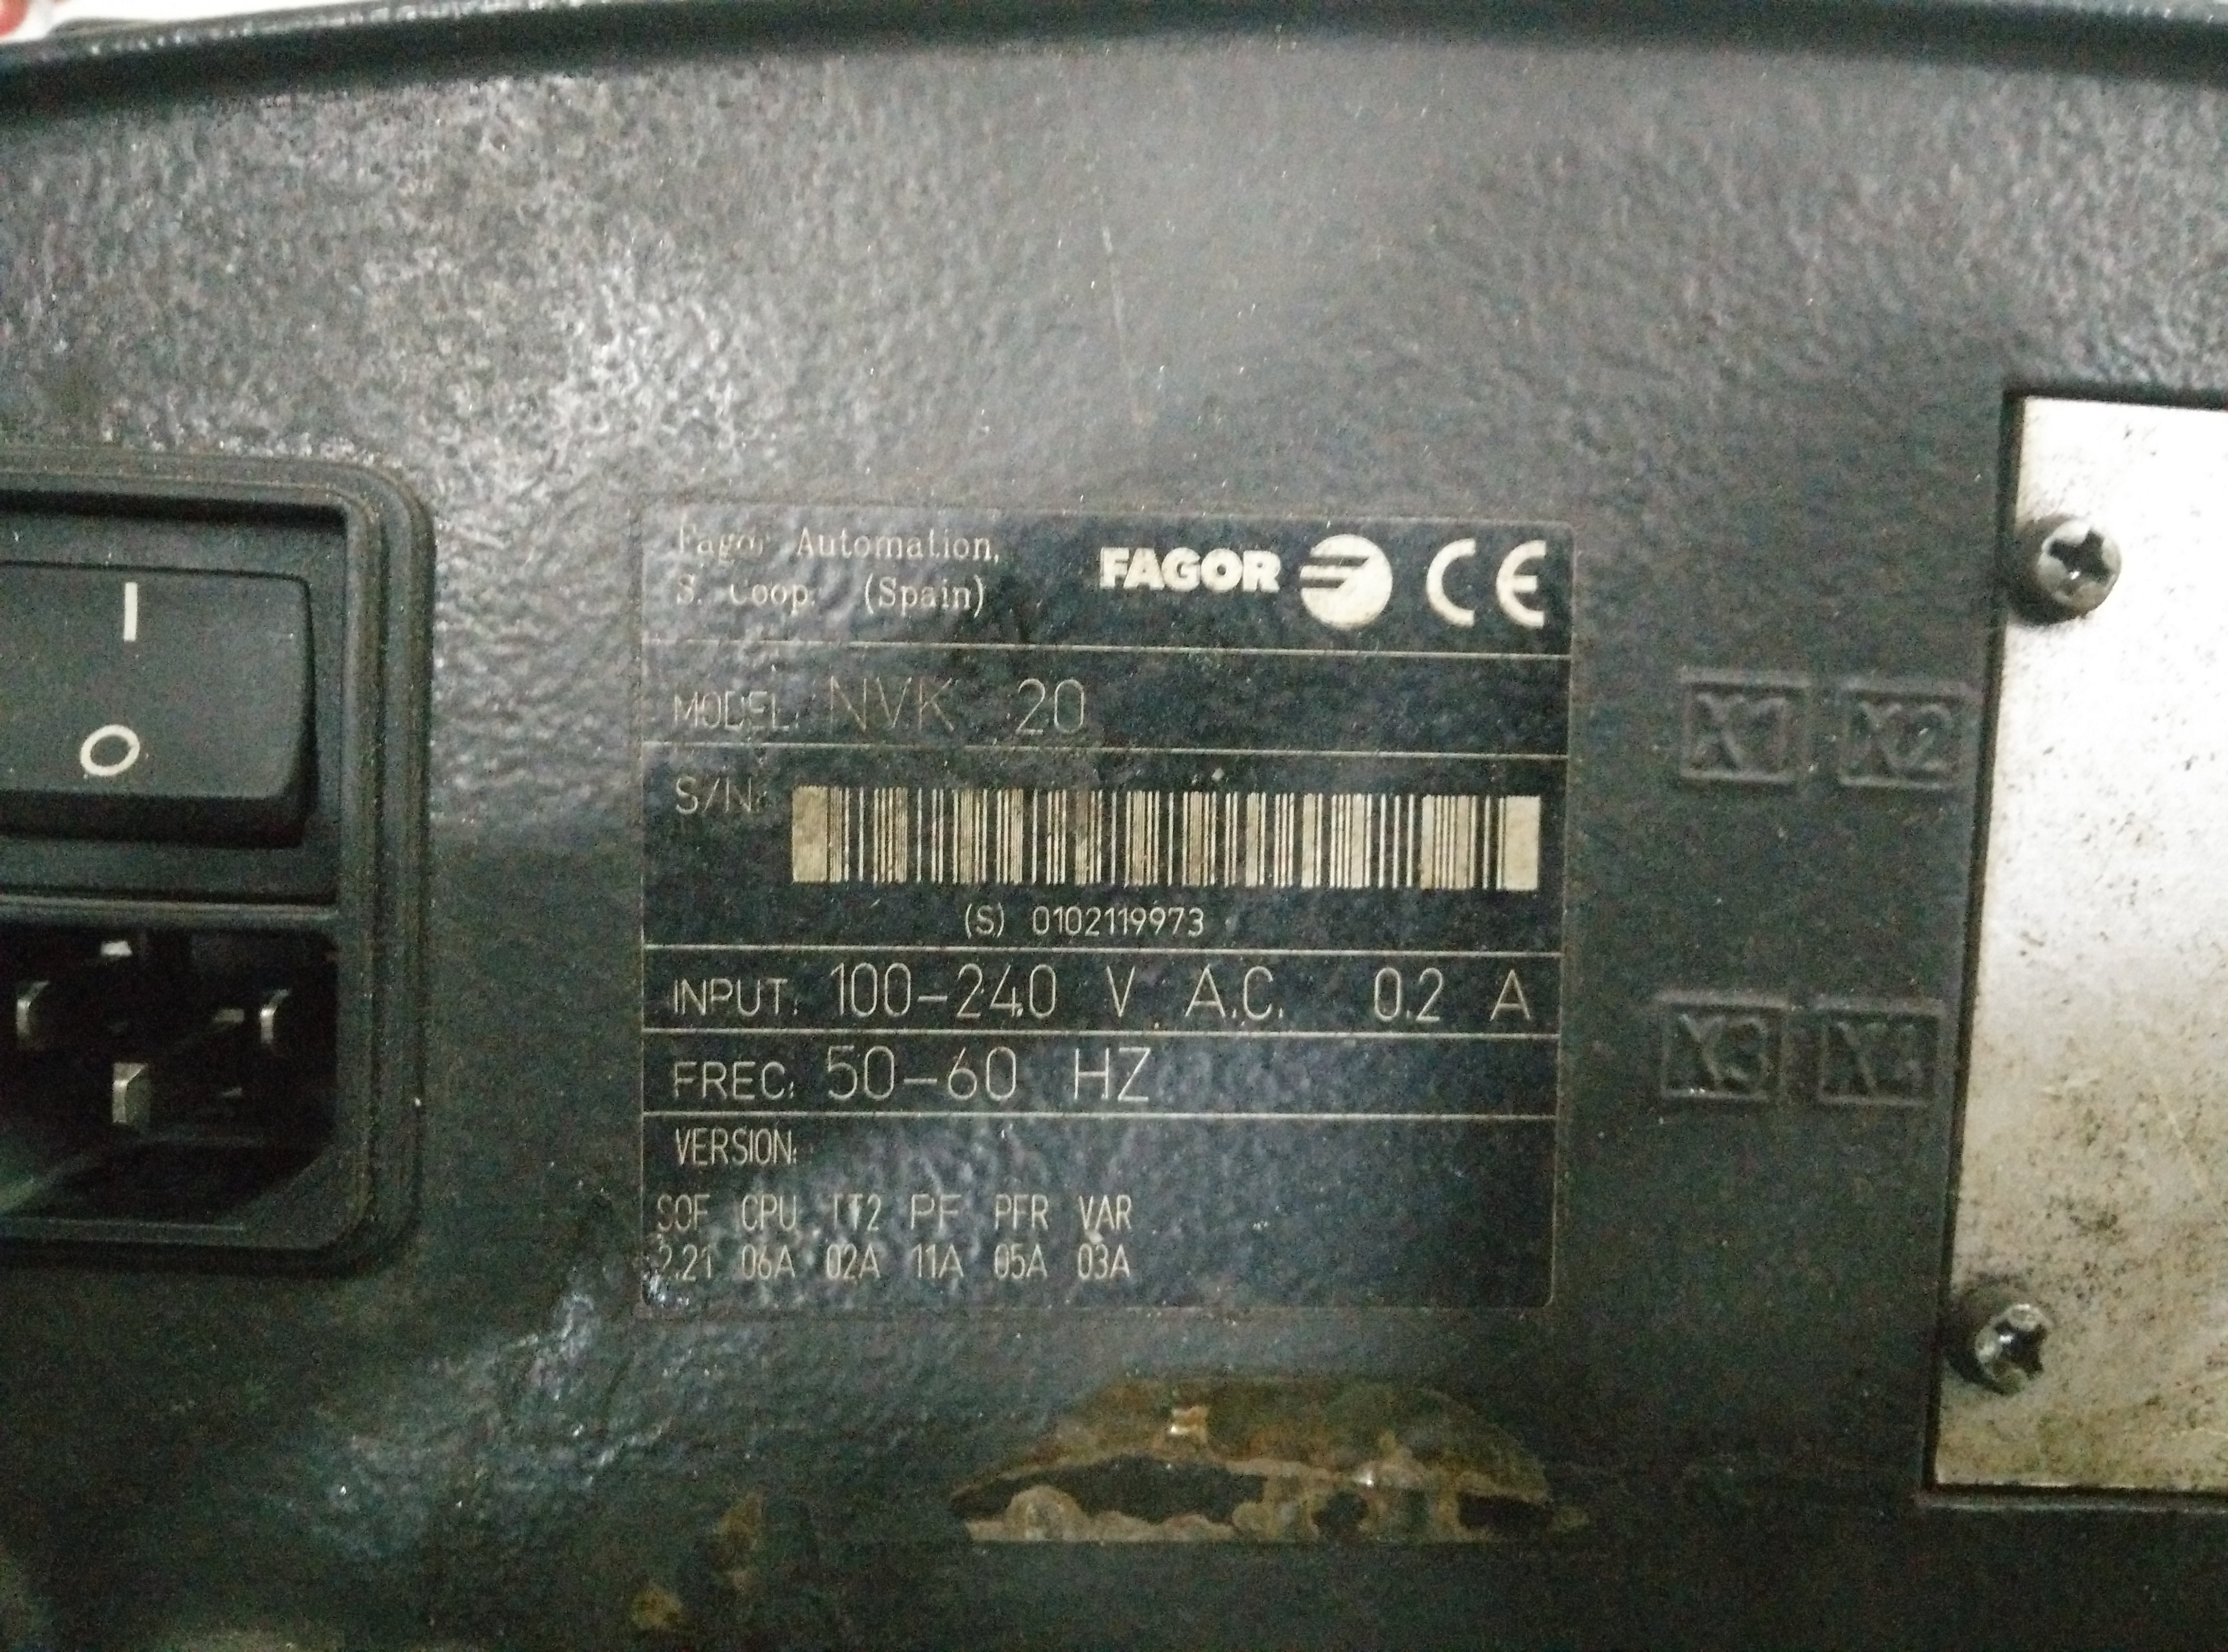 Repair NVK20  FAGOR FAGOR in Malaysia, Singapore, Thailand, Indonesia